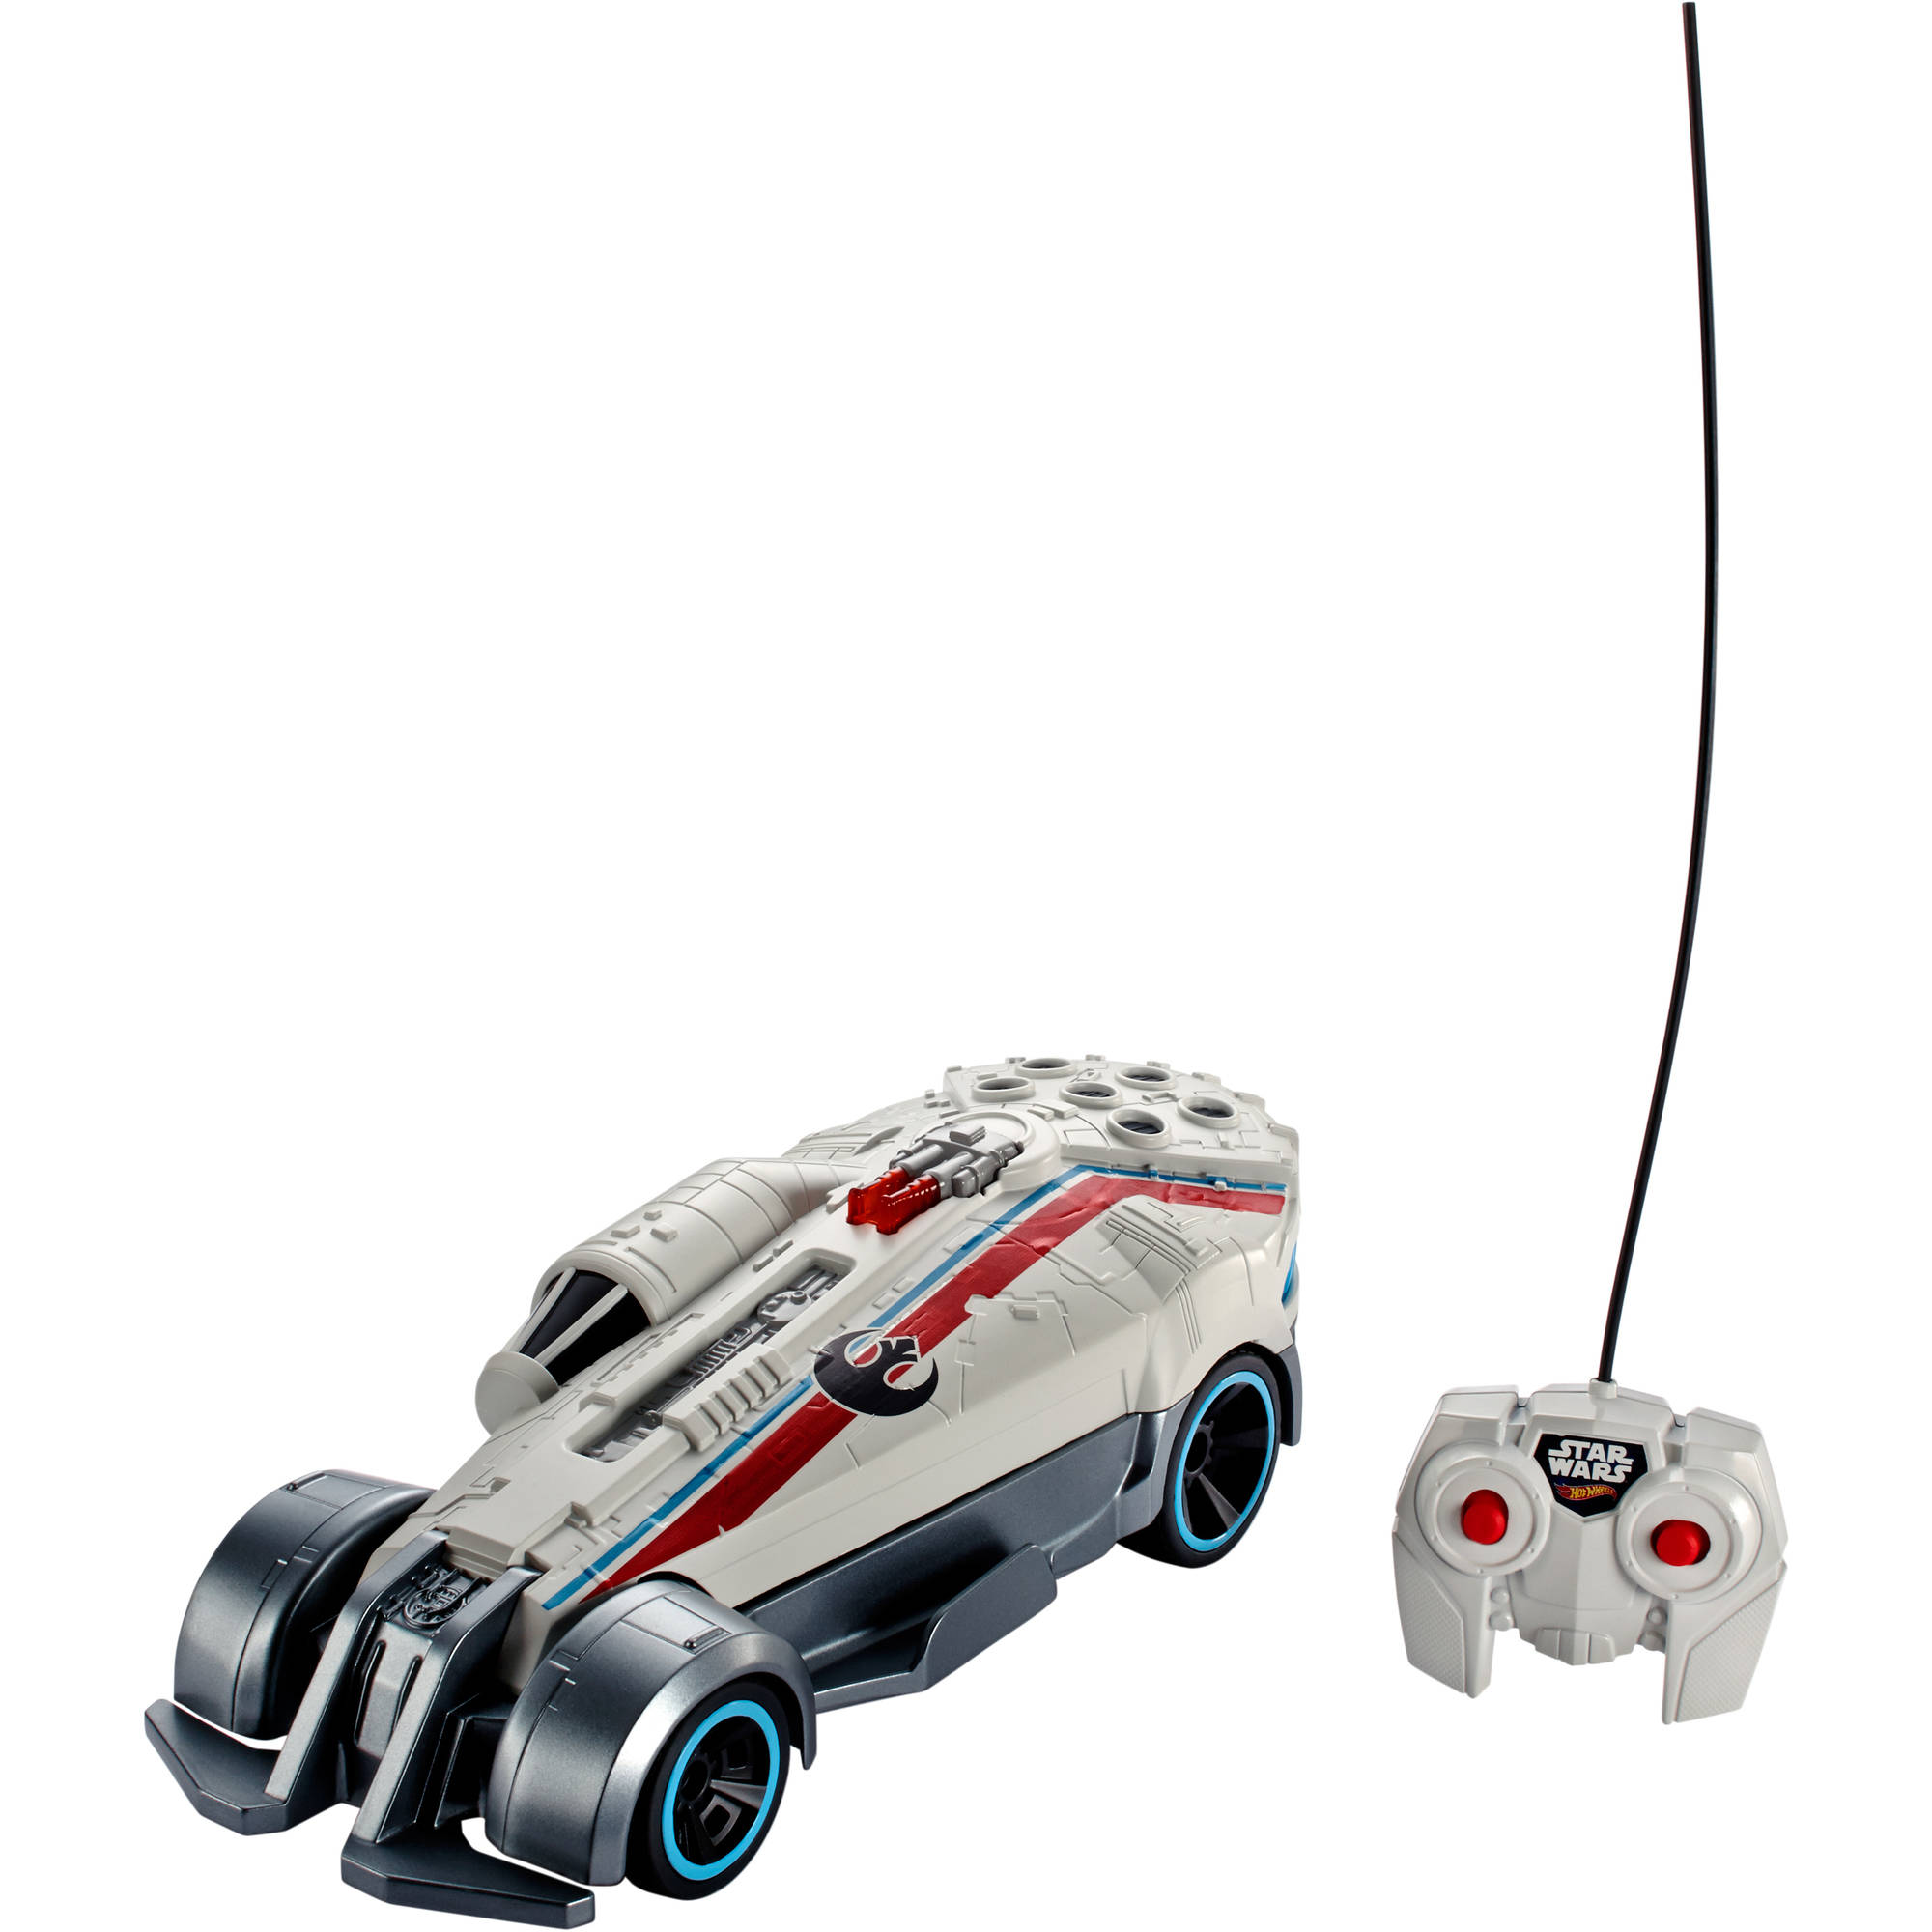 Hot Wheels RC Star Wars Millenium Falcon Carship by Mattel